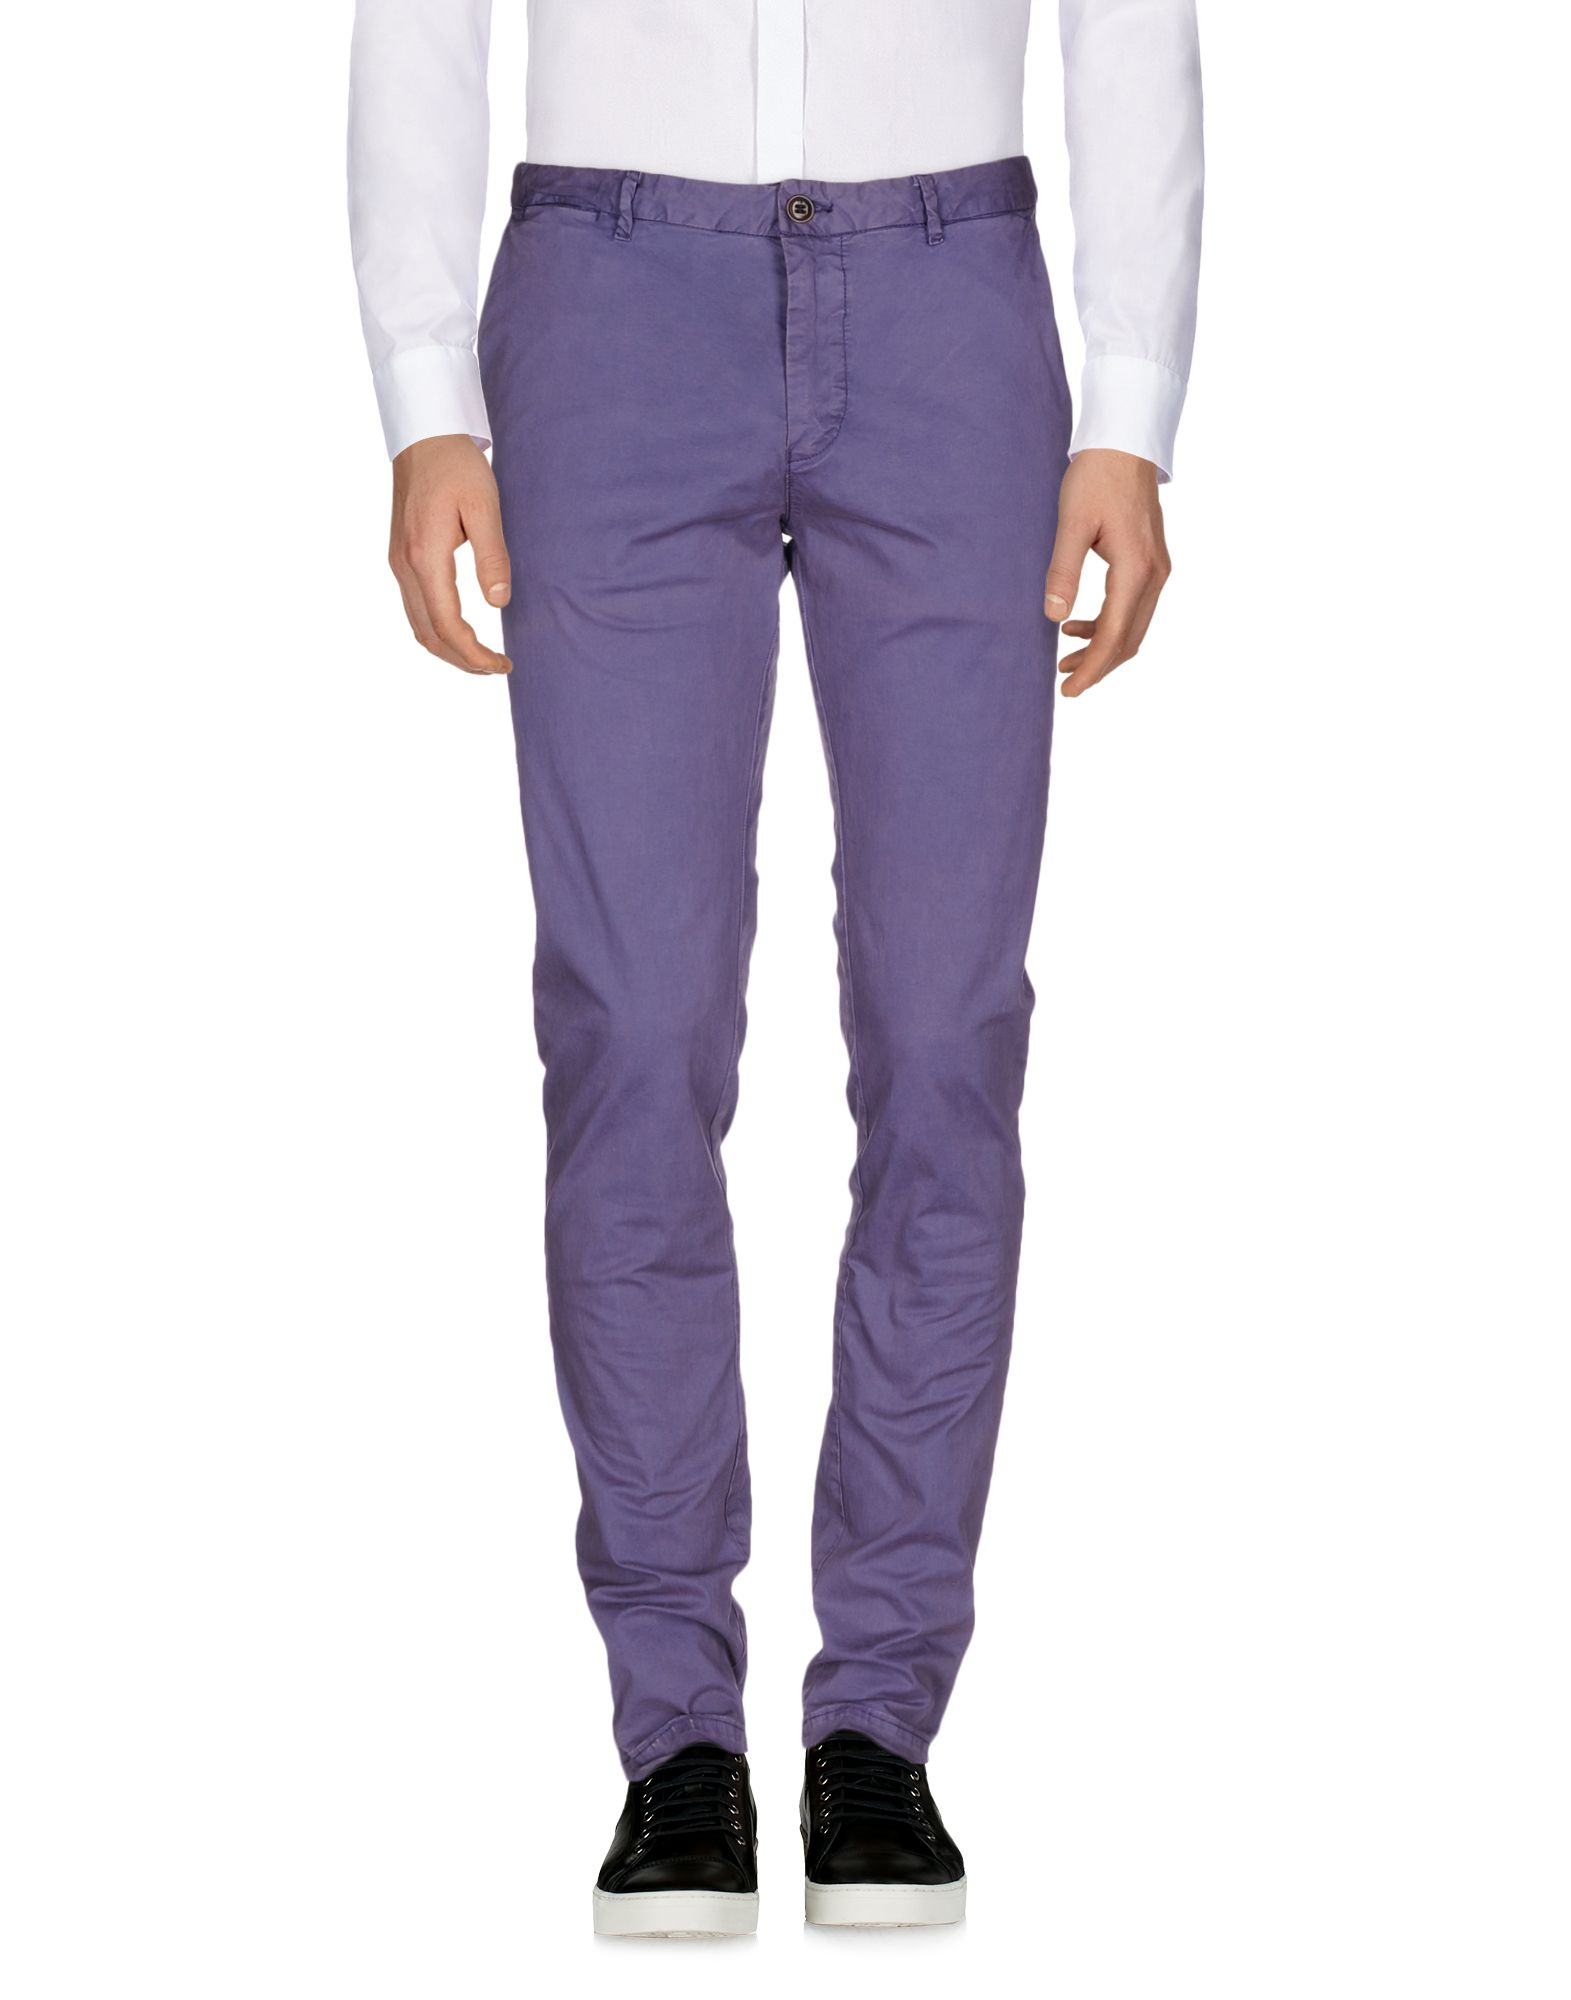 SCOTCH & SODA Повседневные брюки брюки чинос quelle quelle 920895